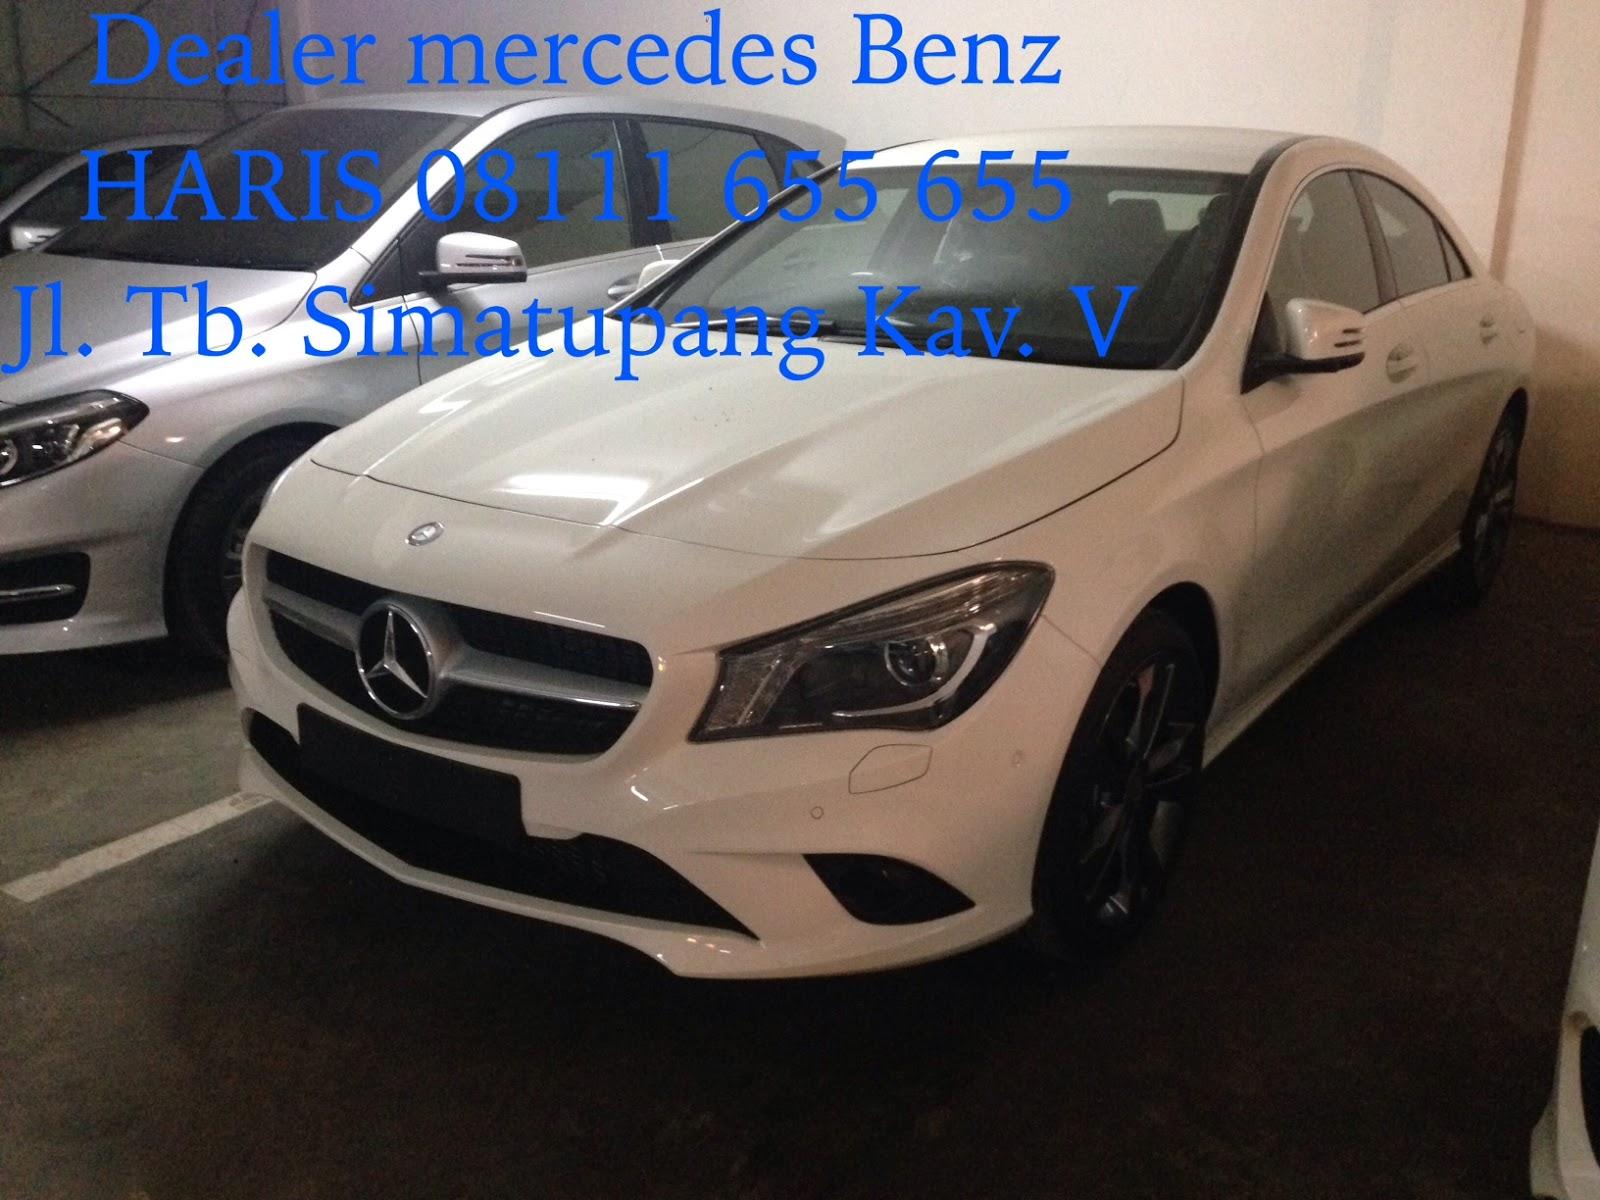 Daftar Harga Mercedes Benz Promo Mercedes Benz Cla 200 Urban